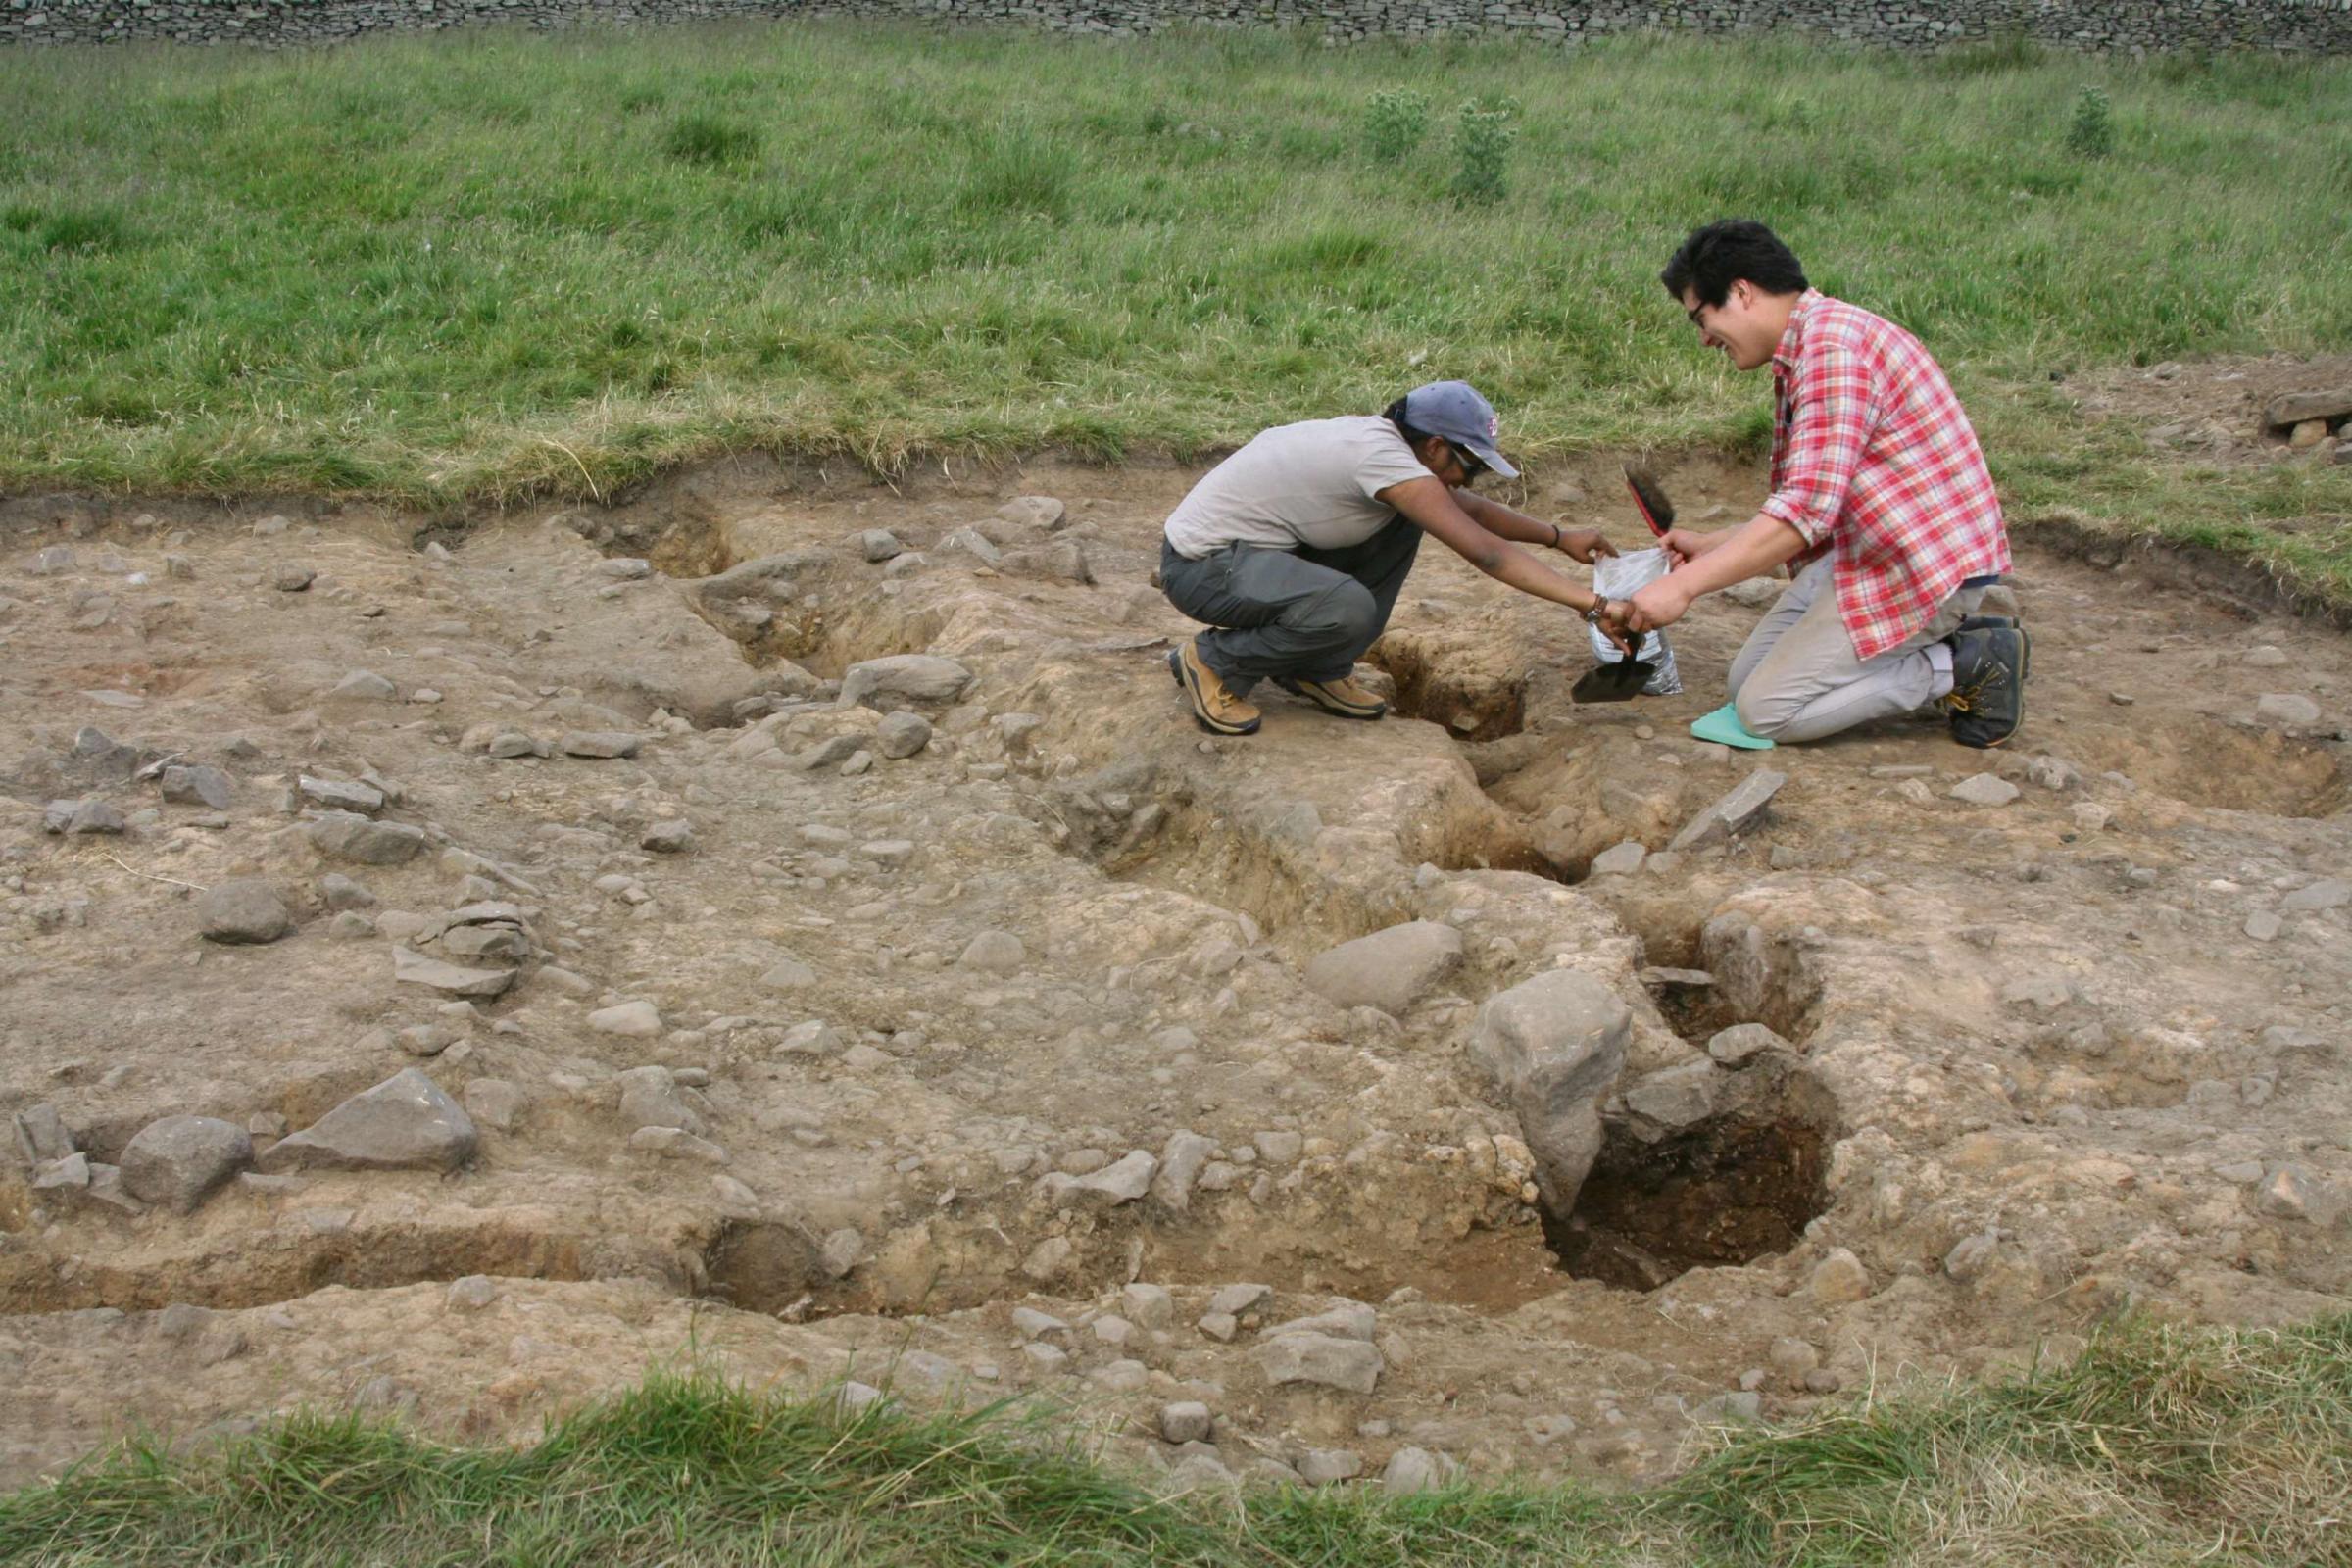 Archaeology students find 6,000-year-old house remains at Yarnbury Henge, Grassington